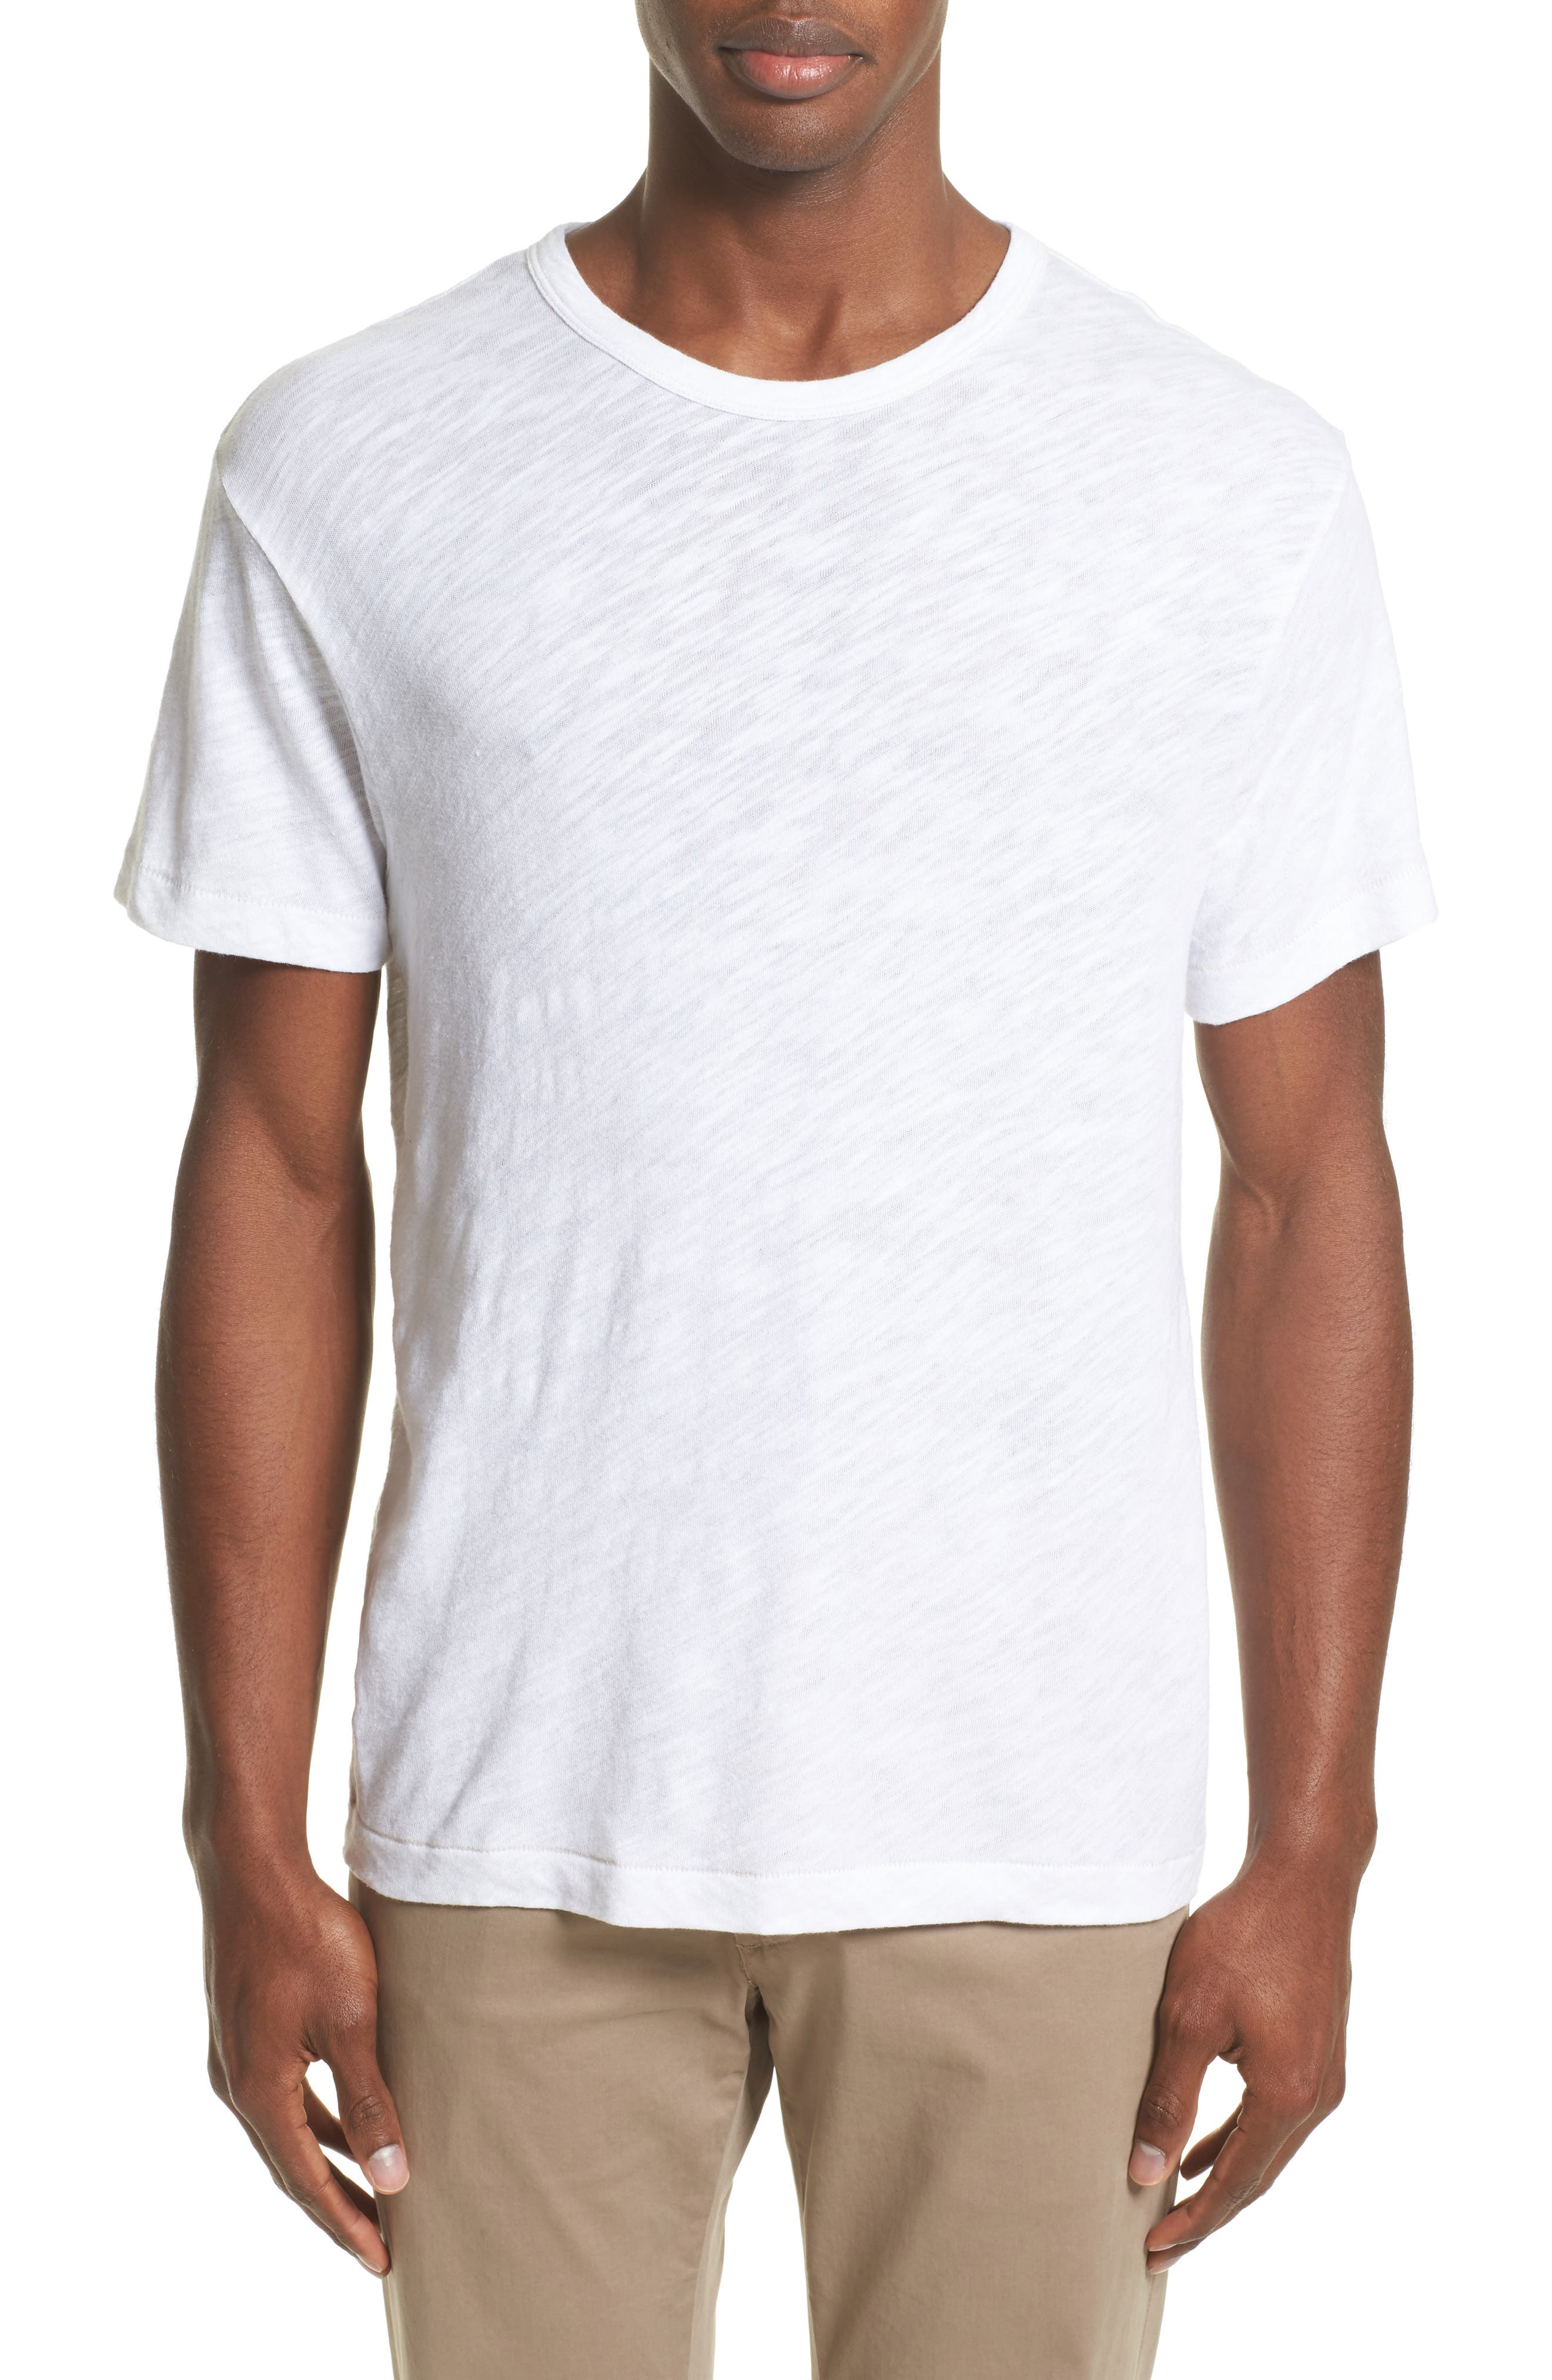 Alternate Image 1 Selected - Todd Snyder + Champion Crewneck T-Shirt